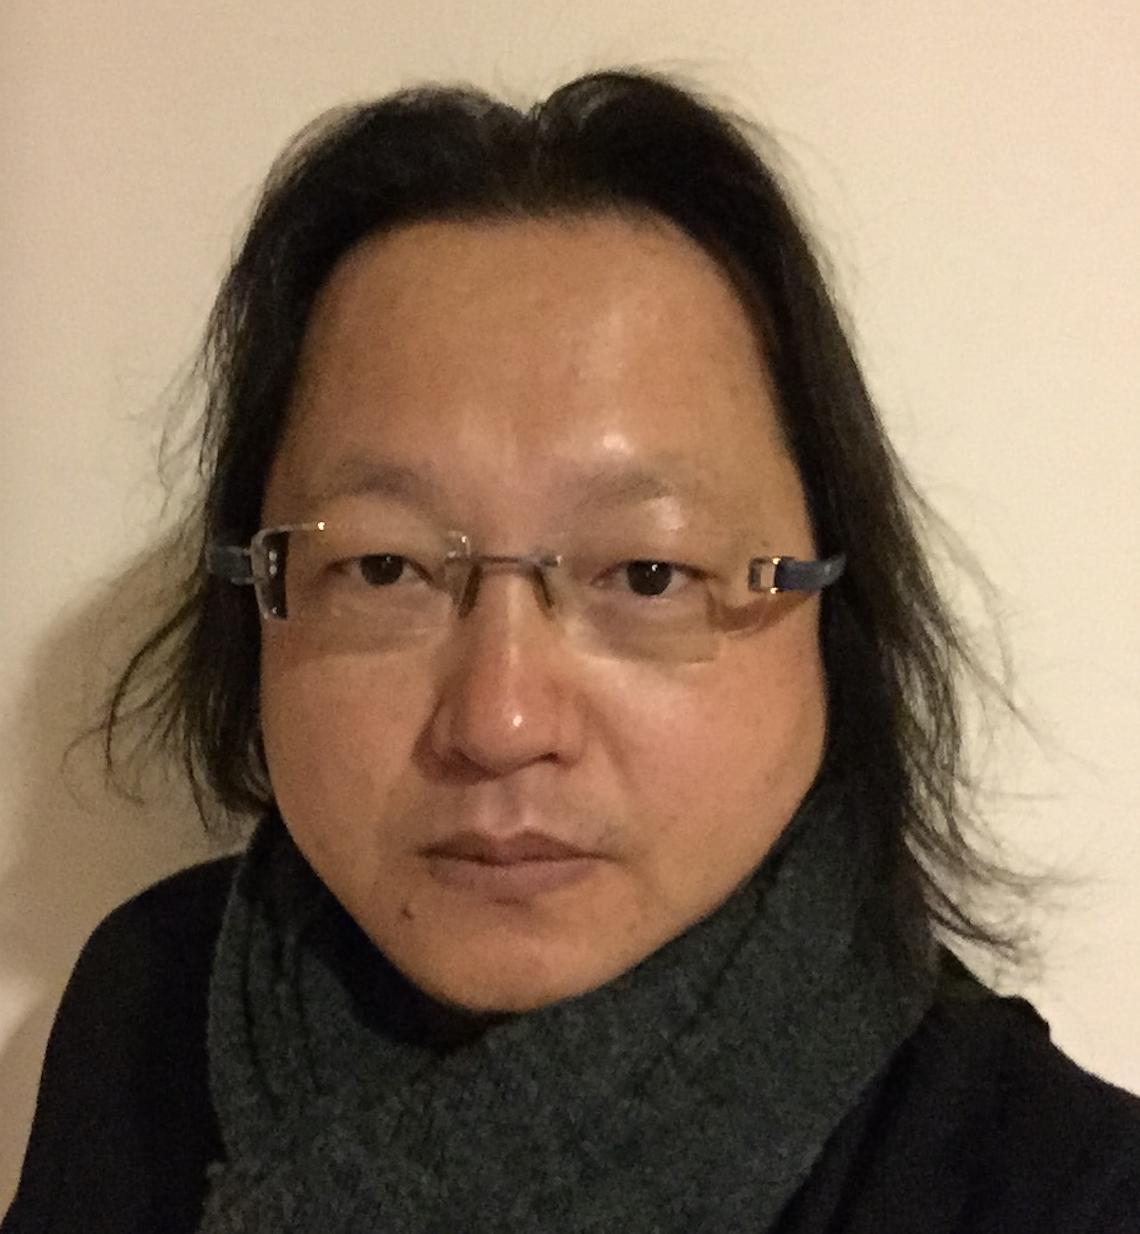 William Chen - CEO of HayMaker GameWilliam has extensive experience in gaming. He served as CTO at Shanda Games and Vice GM at Tencent Games.在美国做过16年的主机游戏,参与制作过二十几款包括使命召唤,星际大战,最终幻想等作品。在2010年回国前担任过动视和迪士尼等公司的技术总监等职。2010回国后先后担任了腾讯副总裁,盛大CTO等。